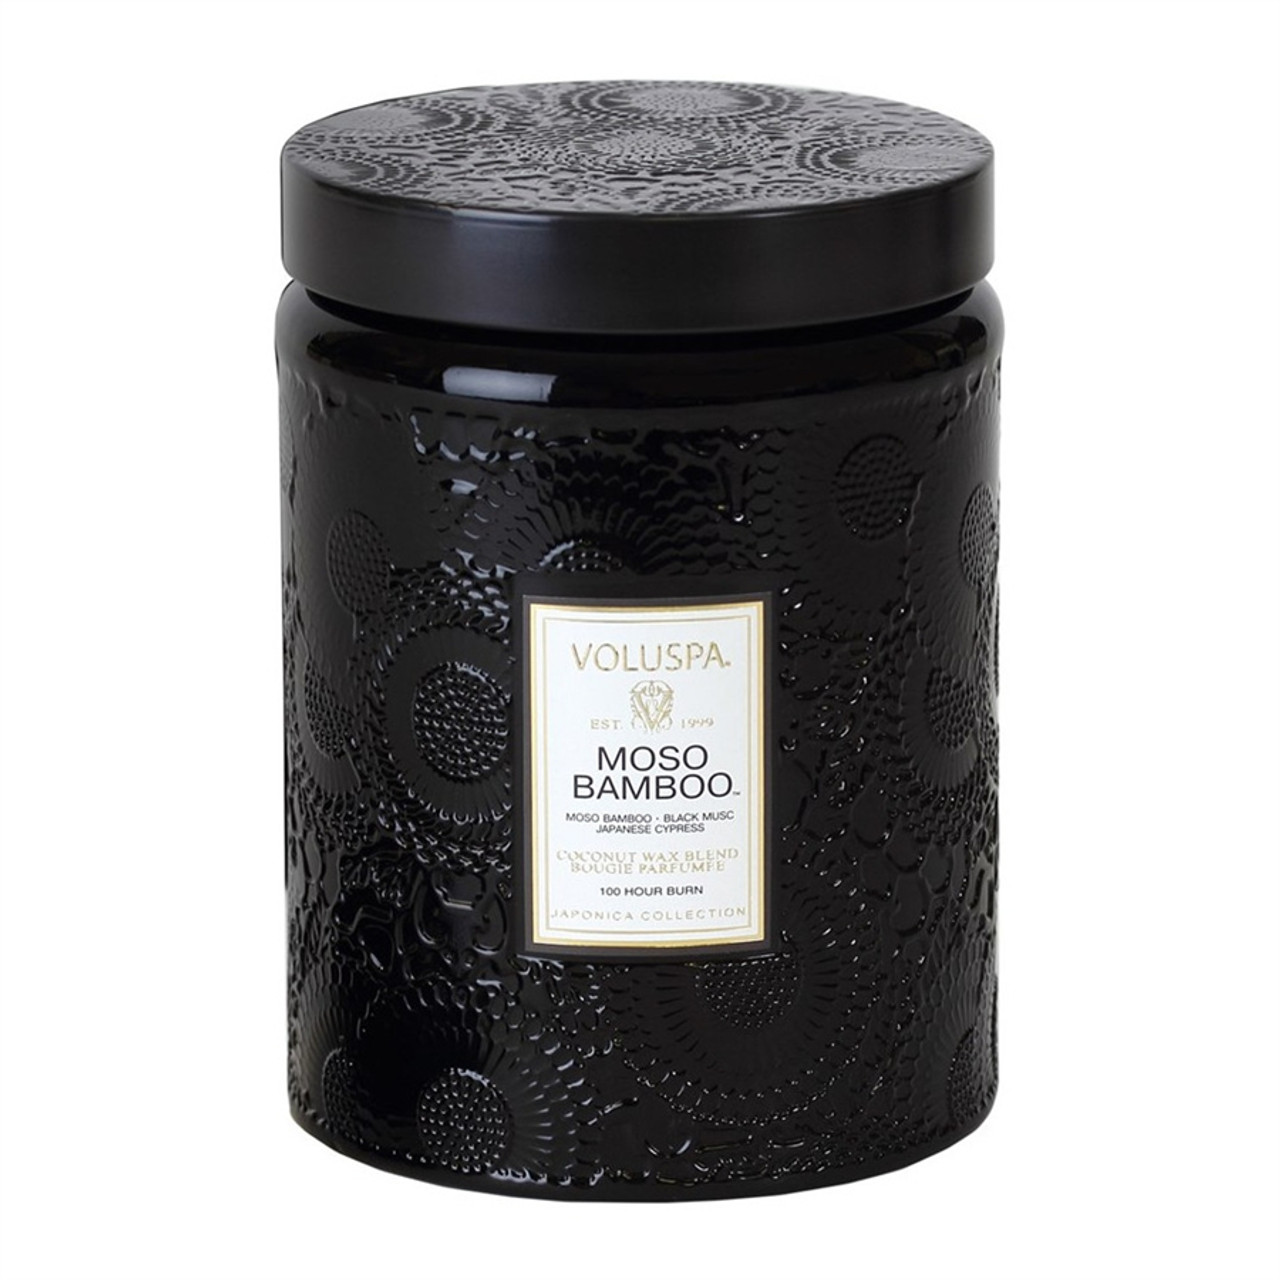 Voluspa Large Jar Candle - Moso Bamboo